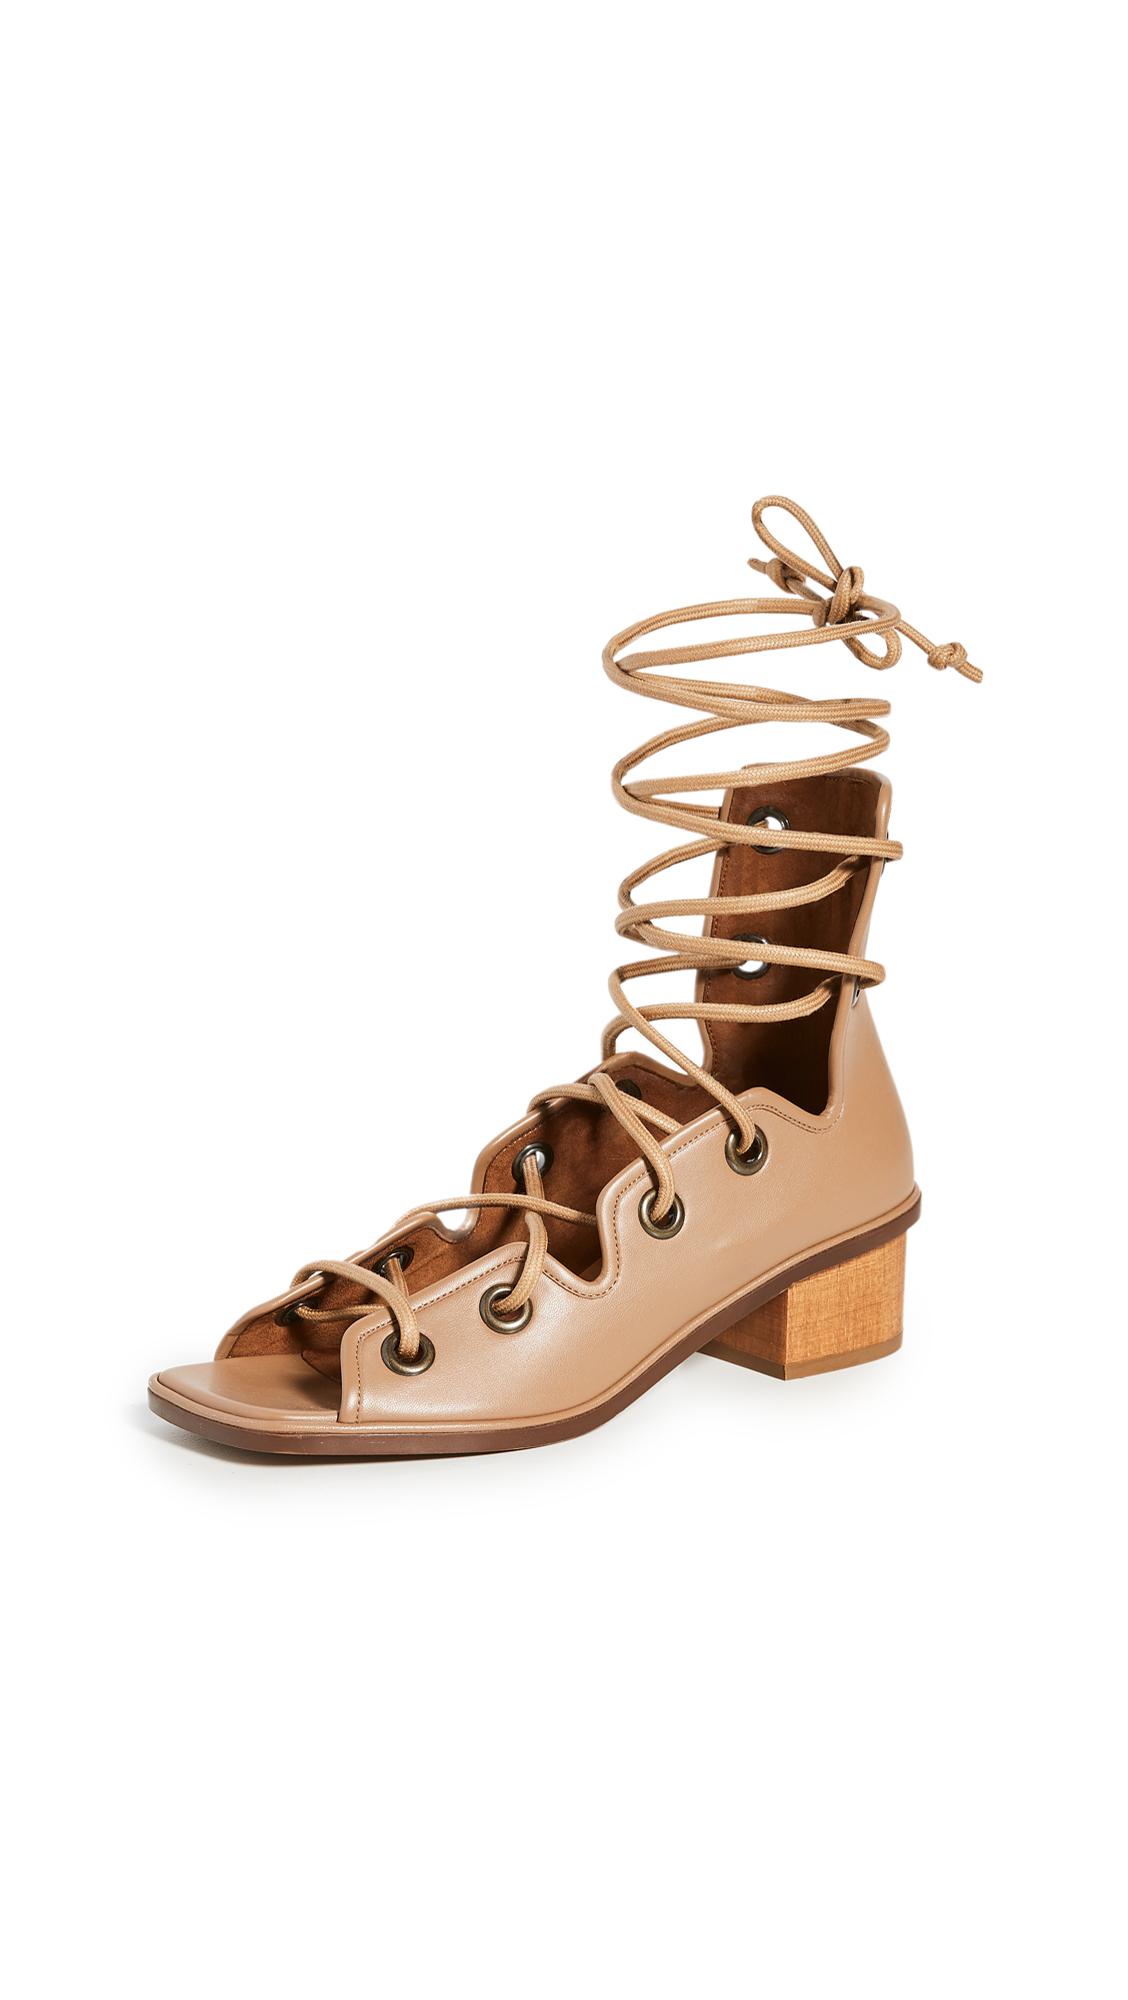 Photo of Stella McCartney Maia Strings Sandals - shop Stella McCartney Sandals, Flat online